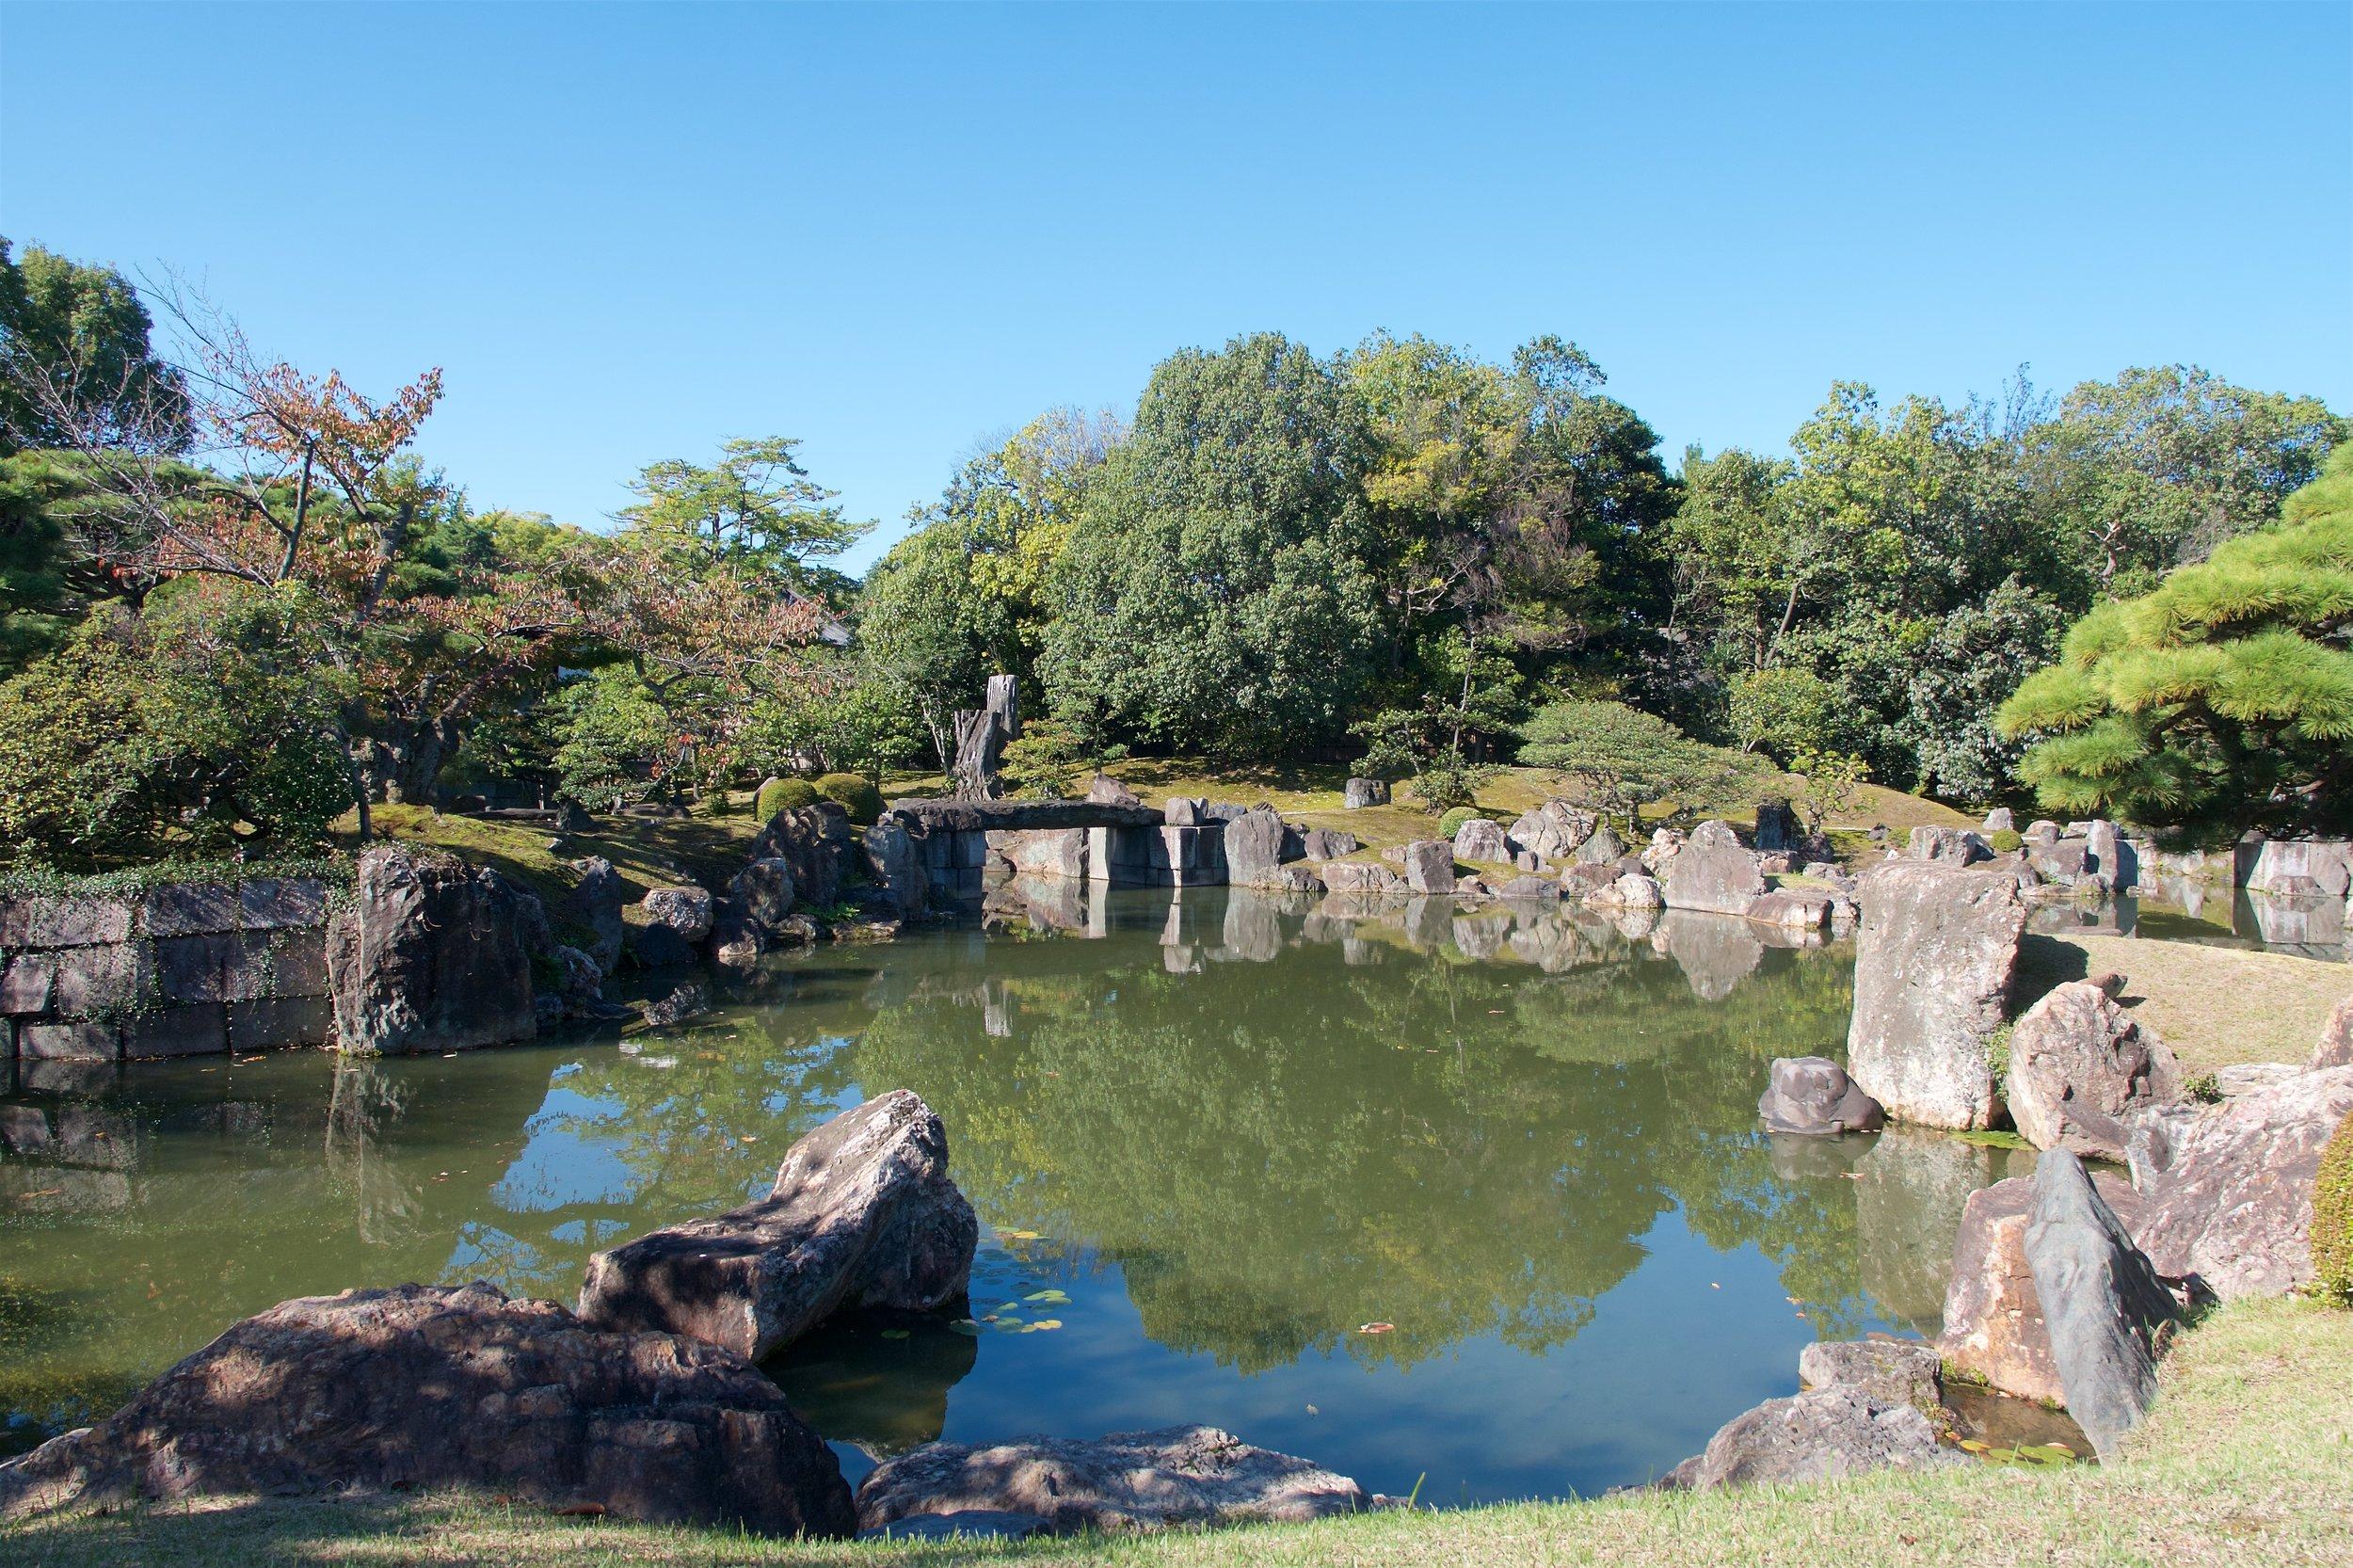 Nioramu Garden